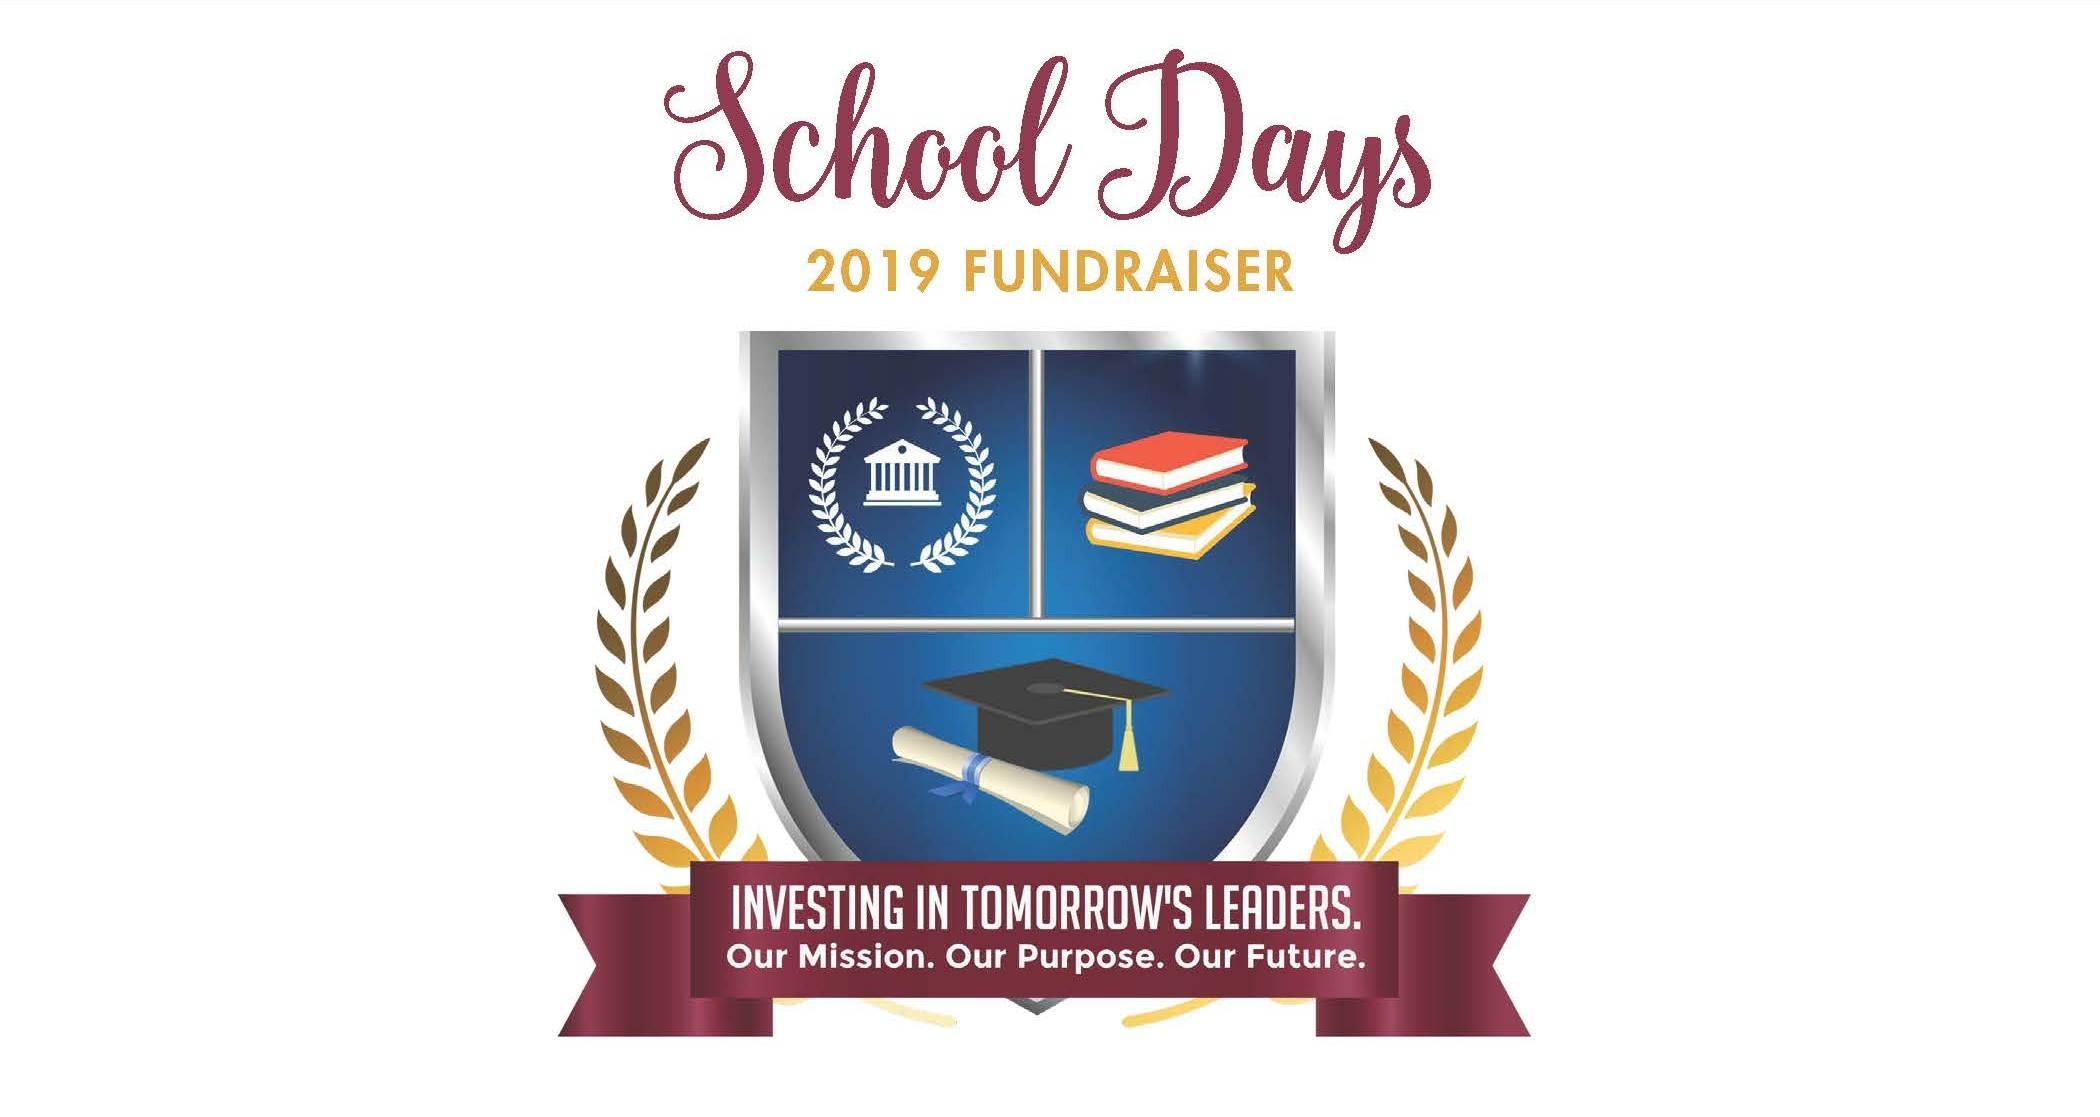 logo-with-school-days-for-eventbrite